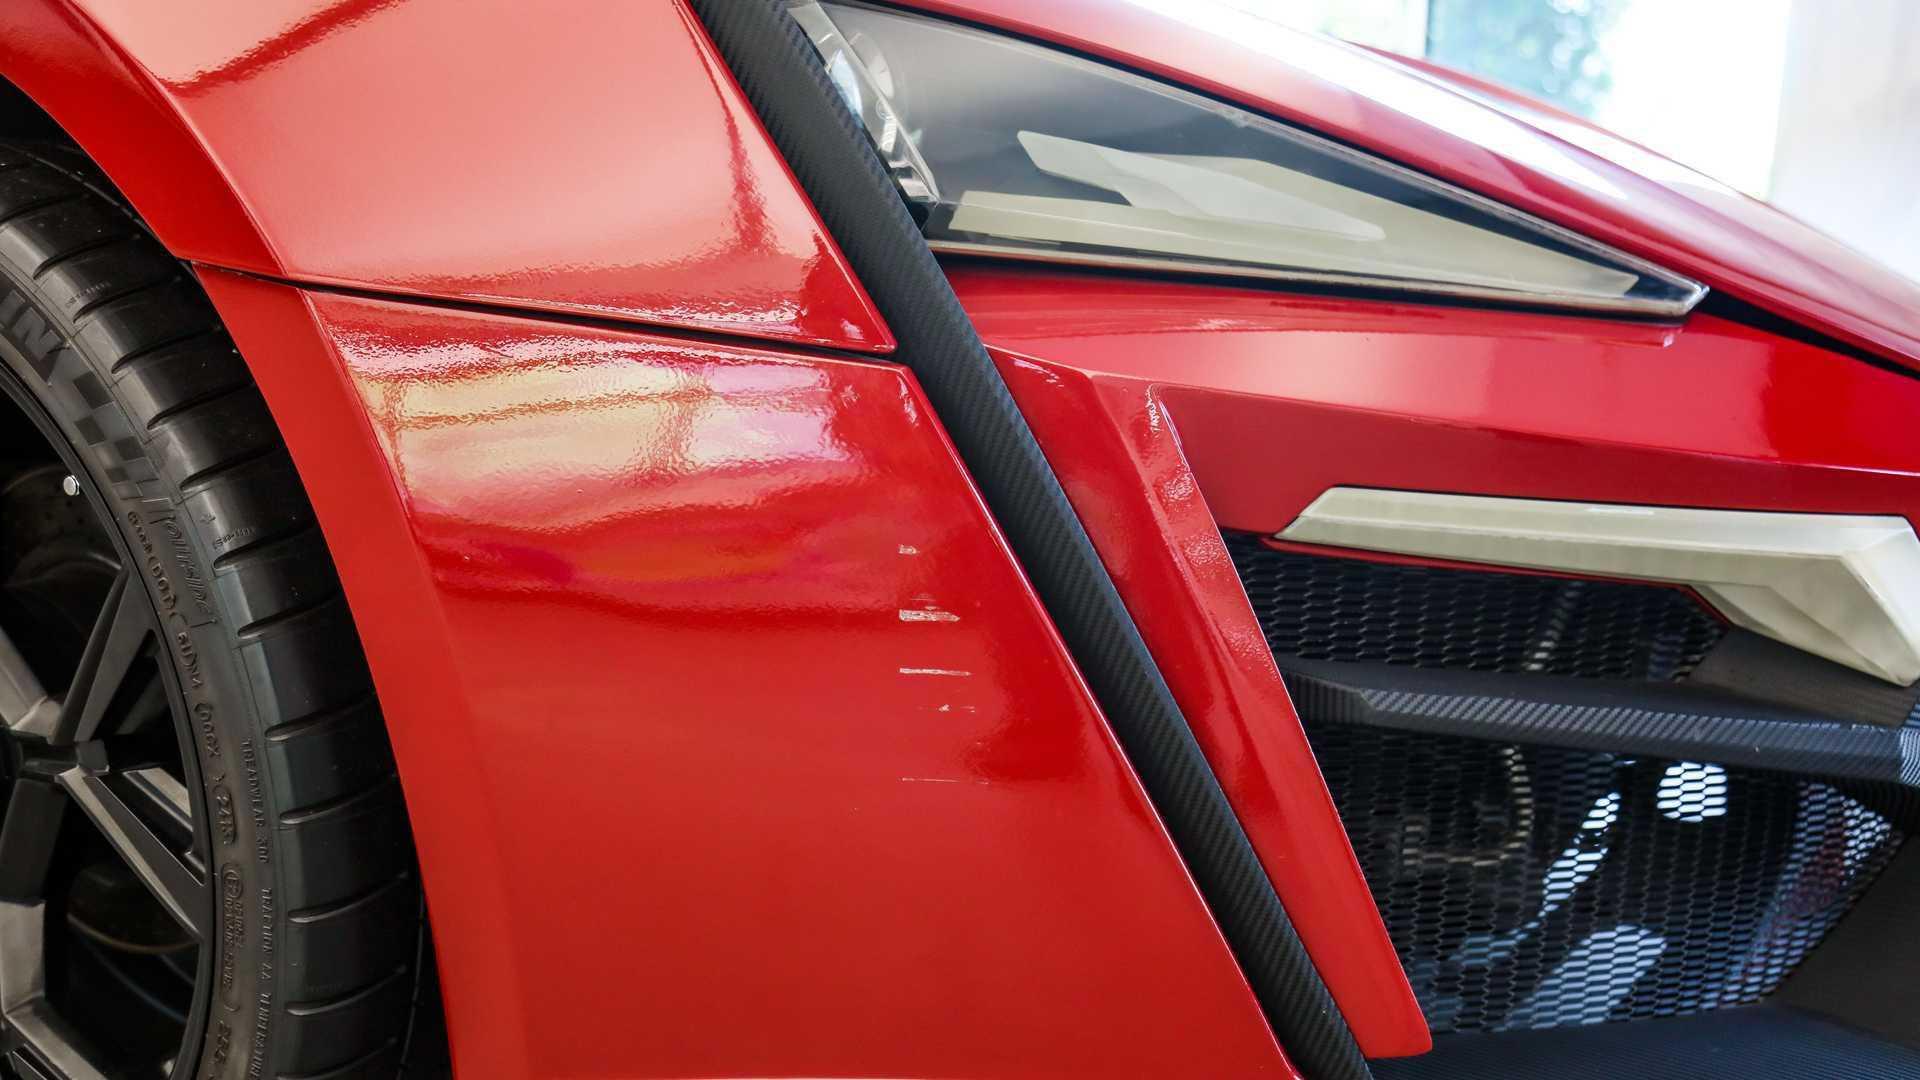 Lykan_HyperSport_stunt_car_sale-0019